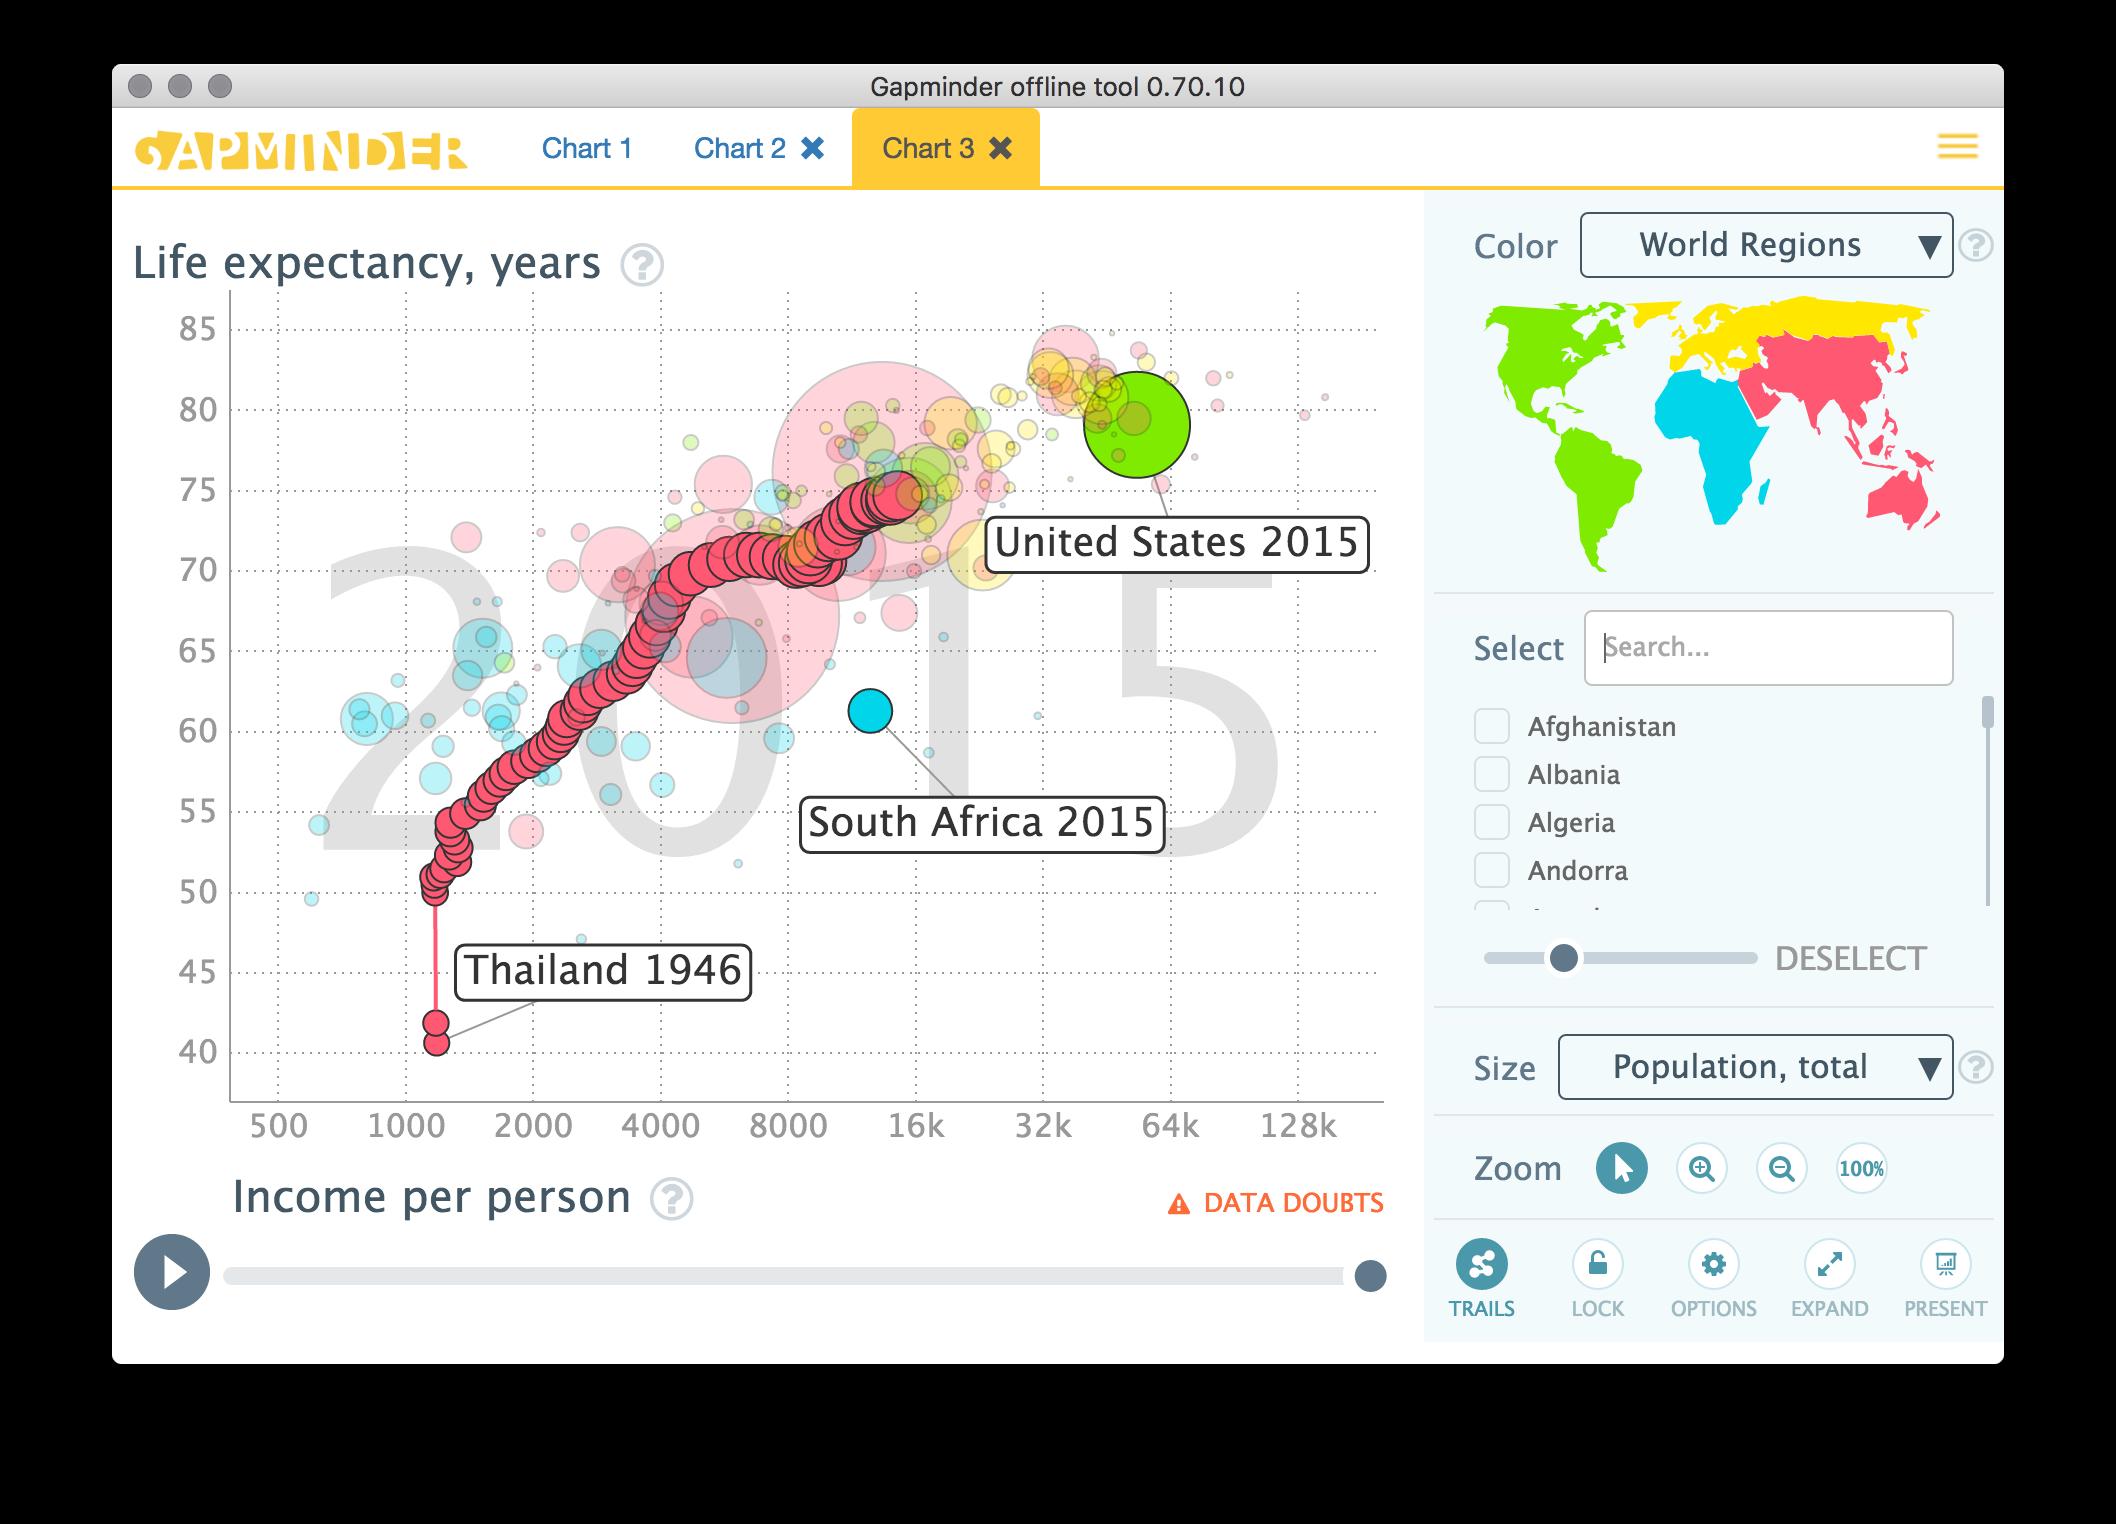 Gapminder Offline Tools